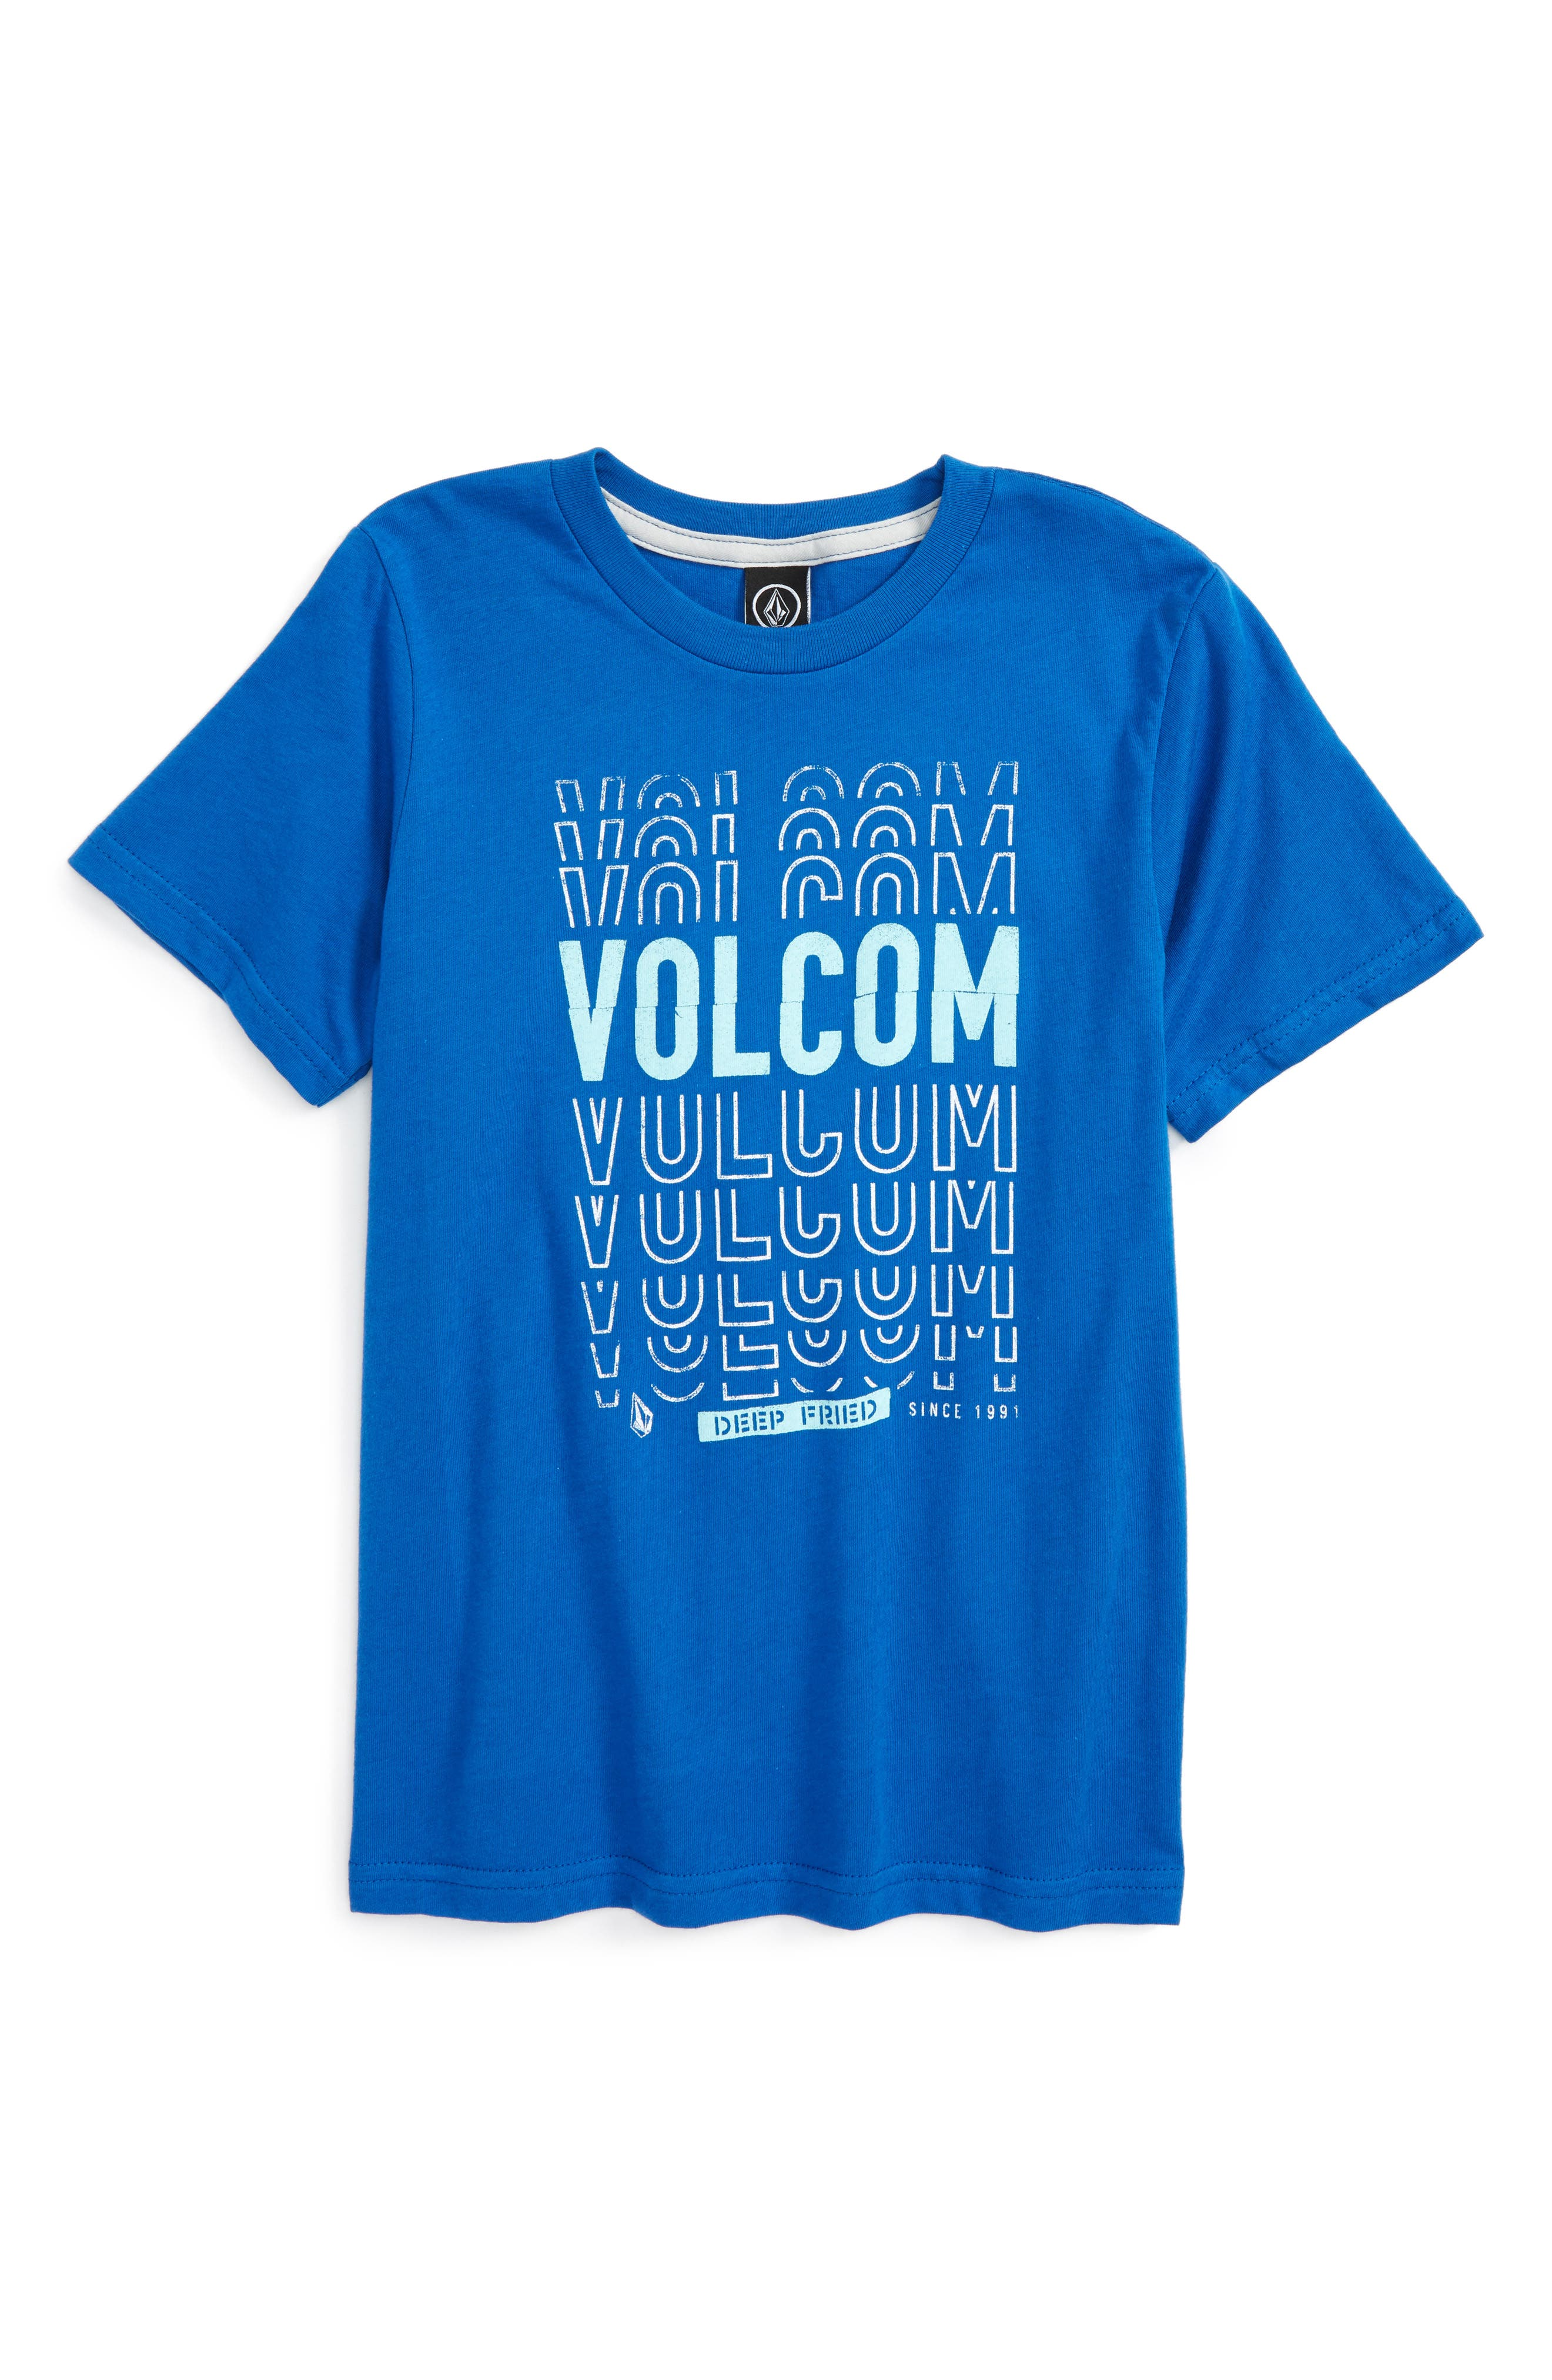 Main Image - Volcom Copy Cut Graphic T-Shirt (Toddler Boys & Little Boys)